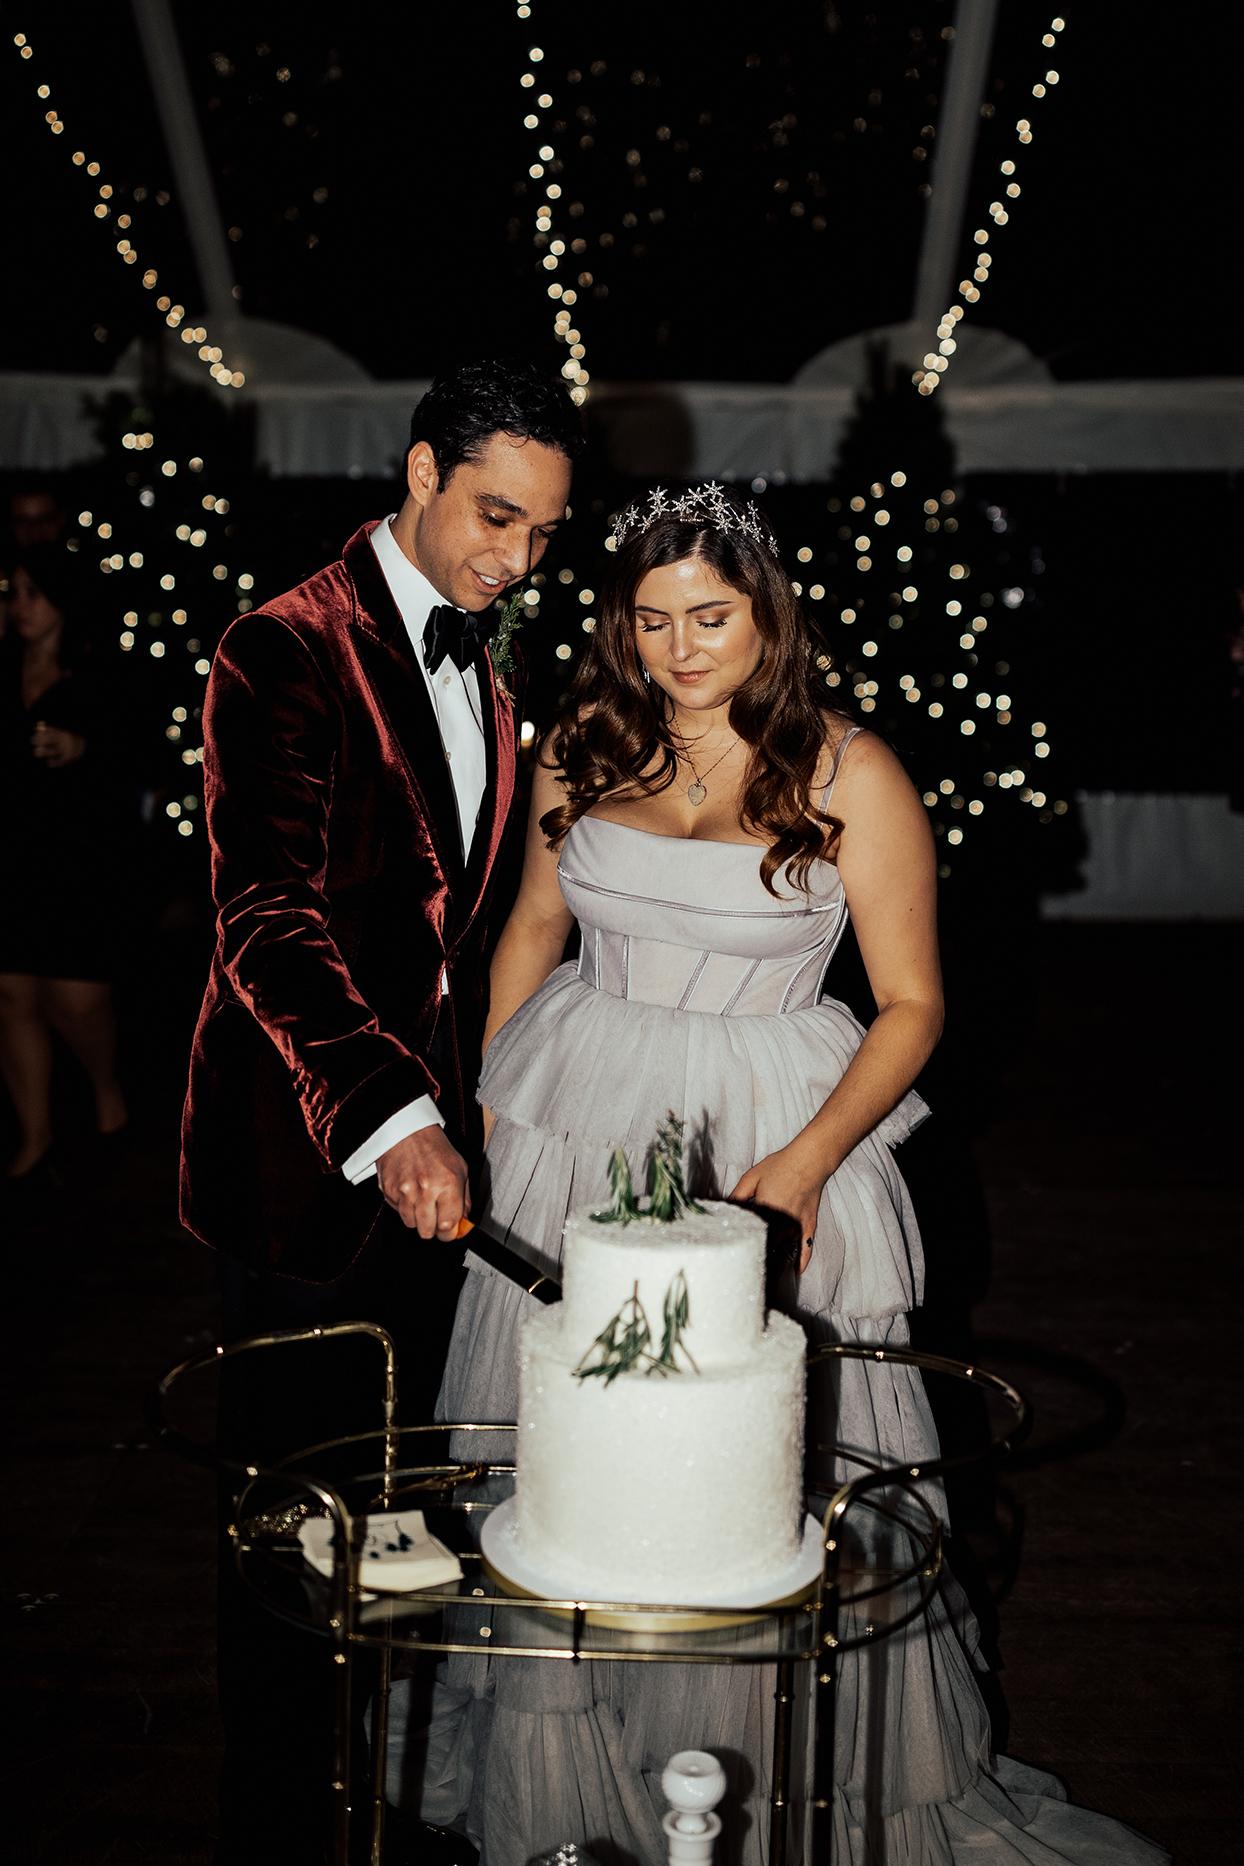 noelle danny cutting wedding cake